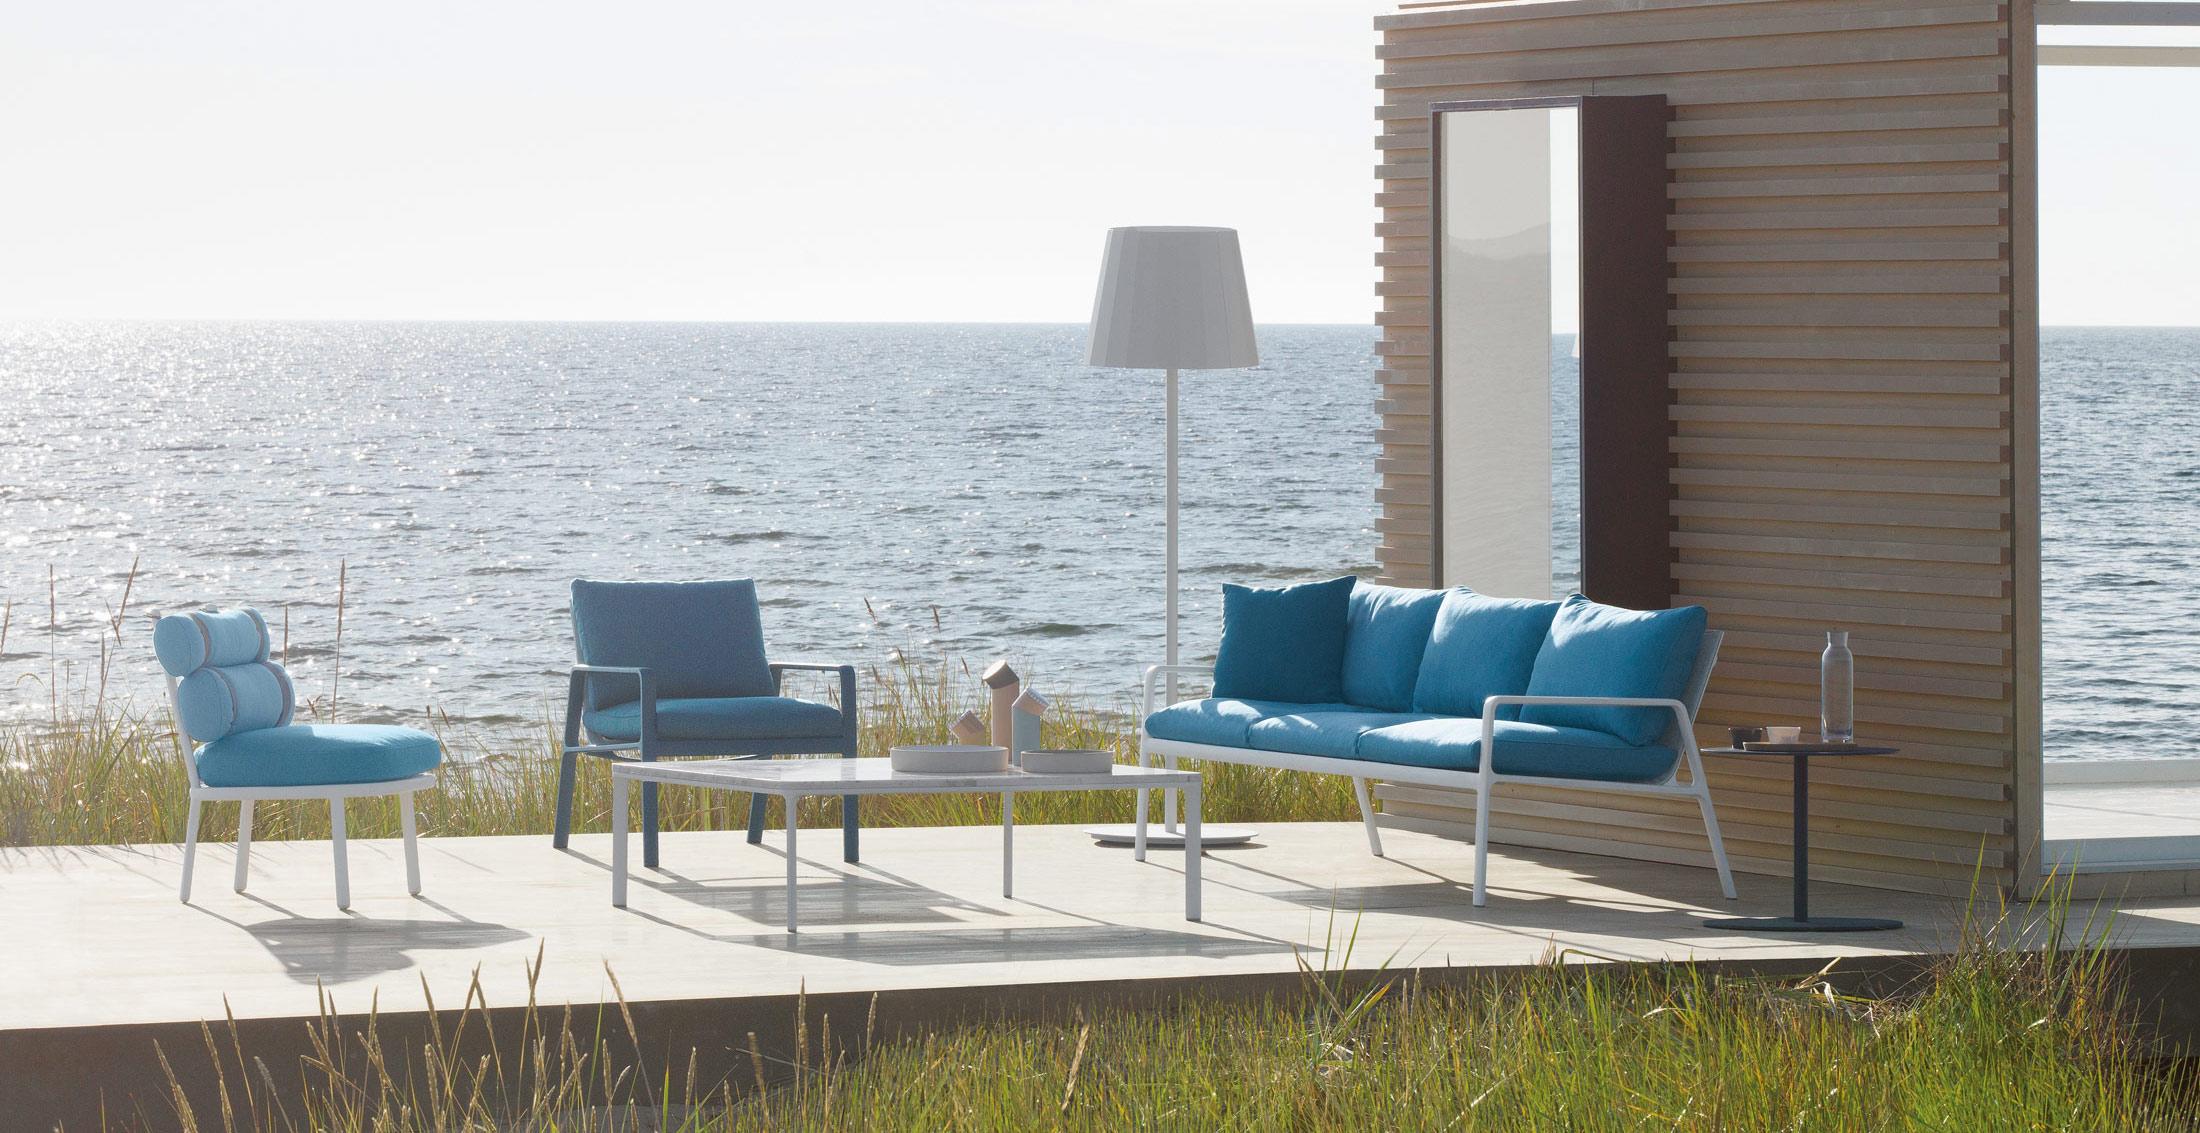 conjunto muebles terraza playa kettal mallorca